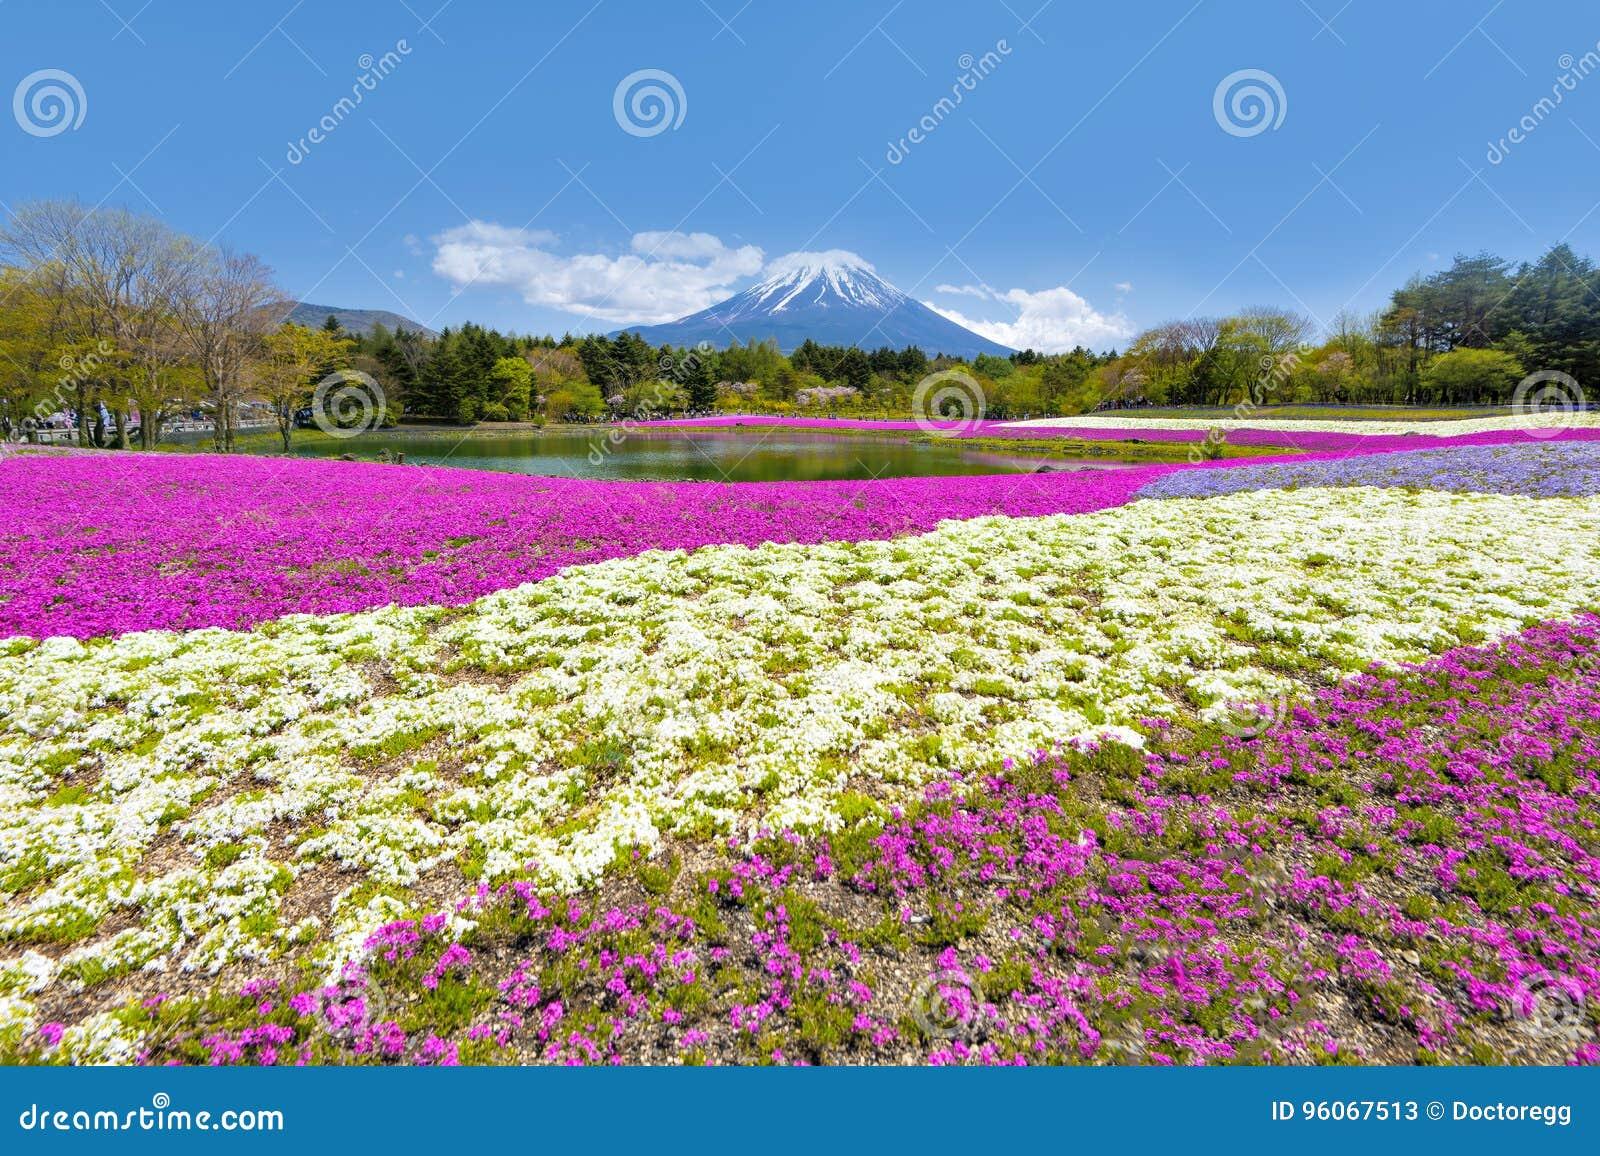 Гора Фудзи и фестиваль сада Shibazakura пинка в солнечном дне на Shizuoka